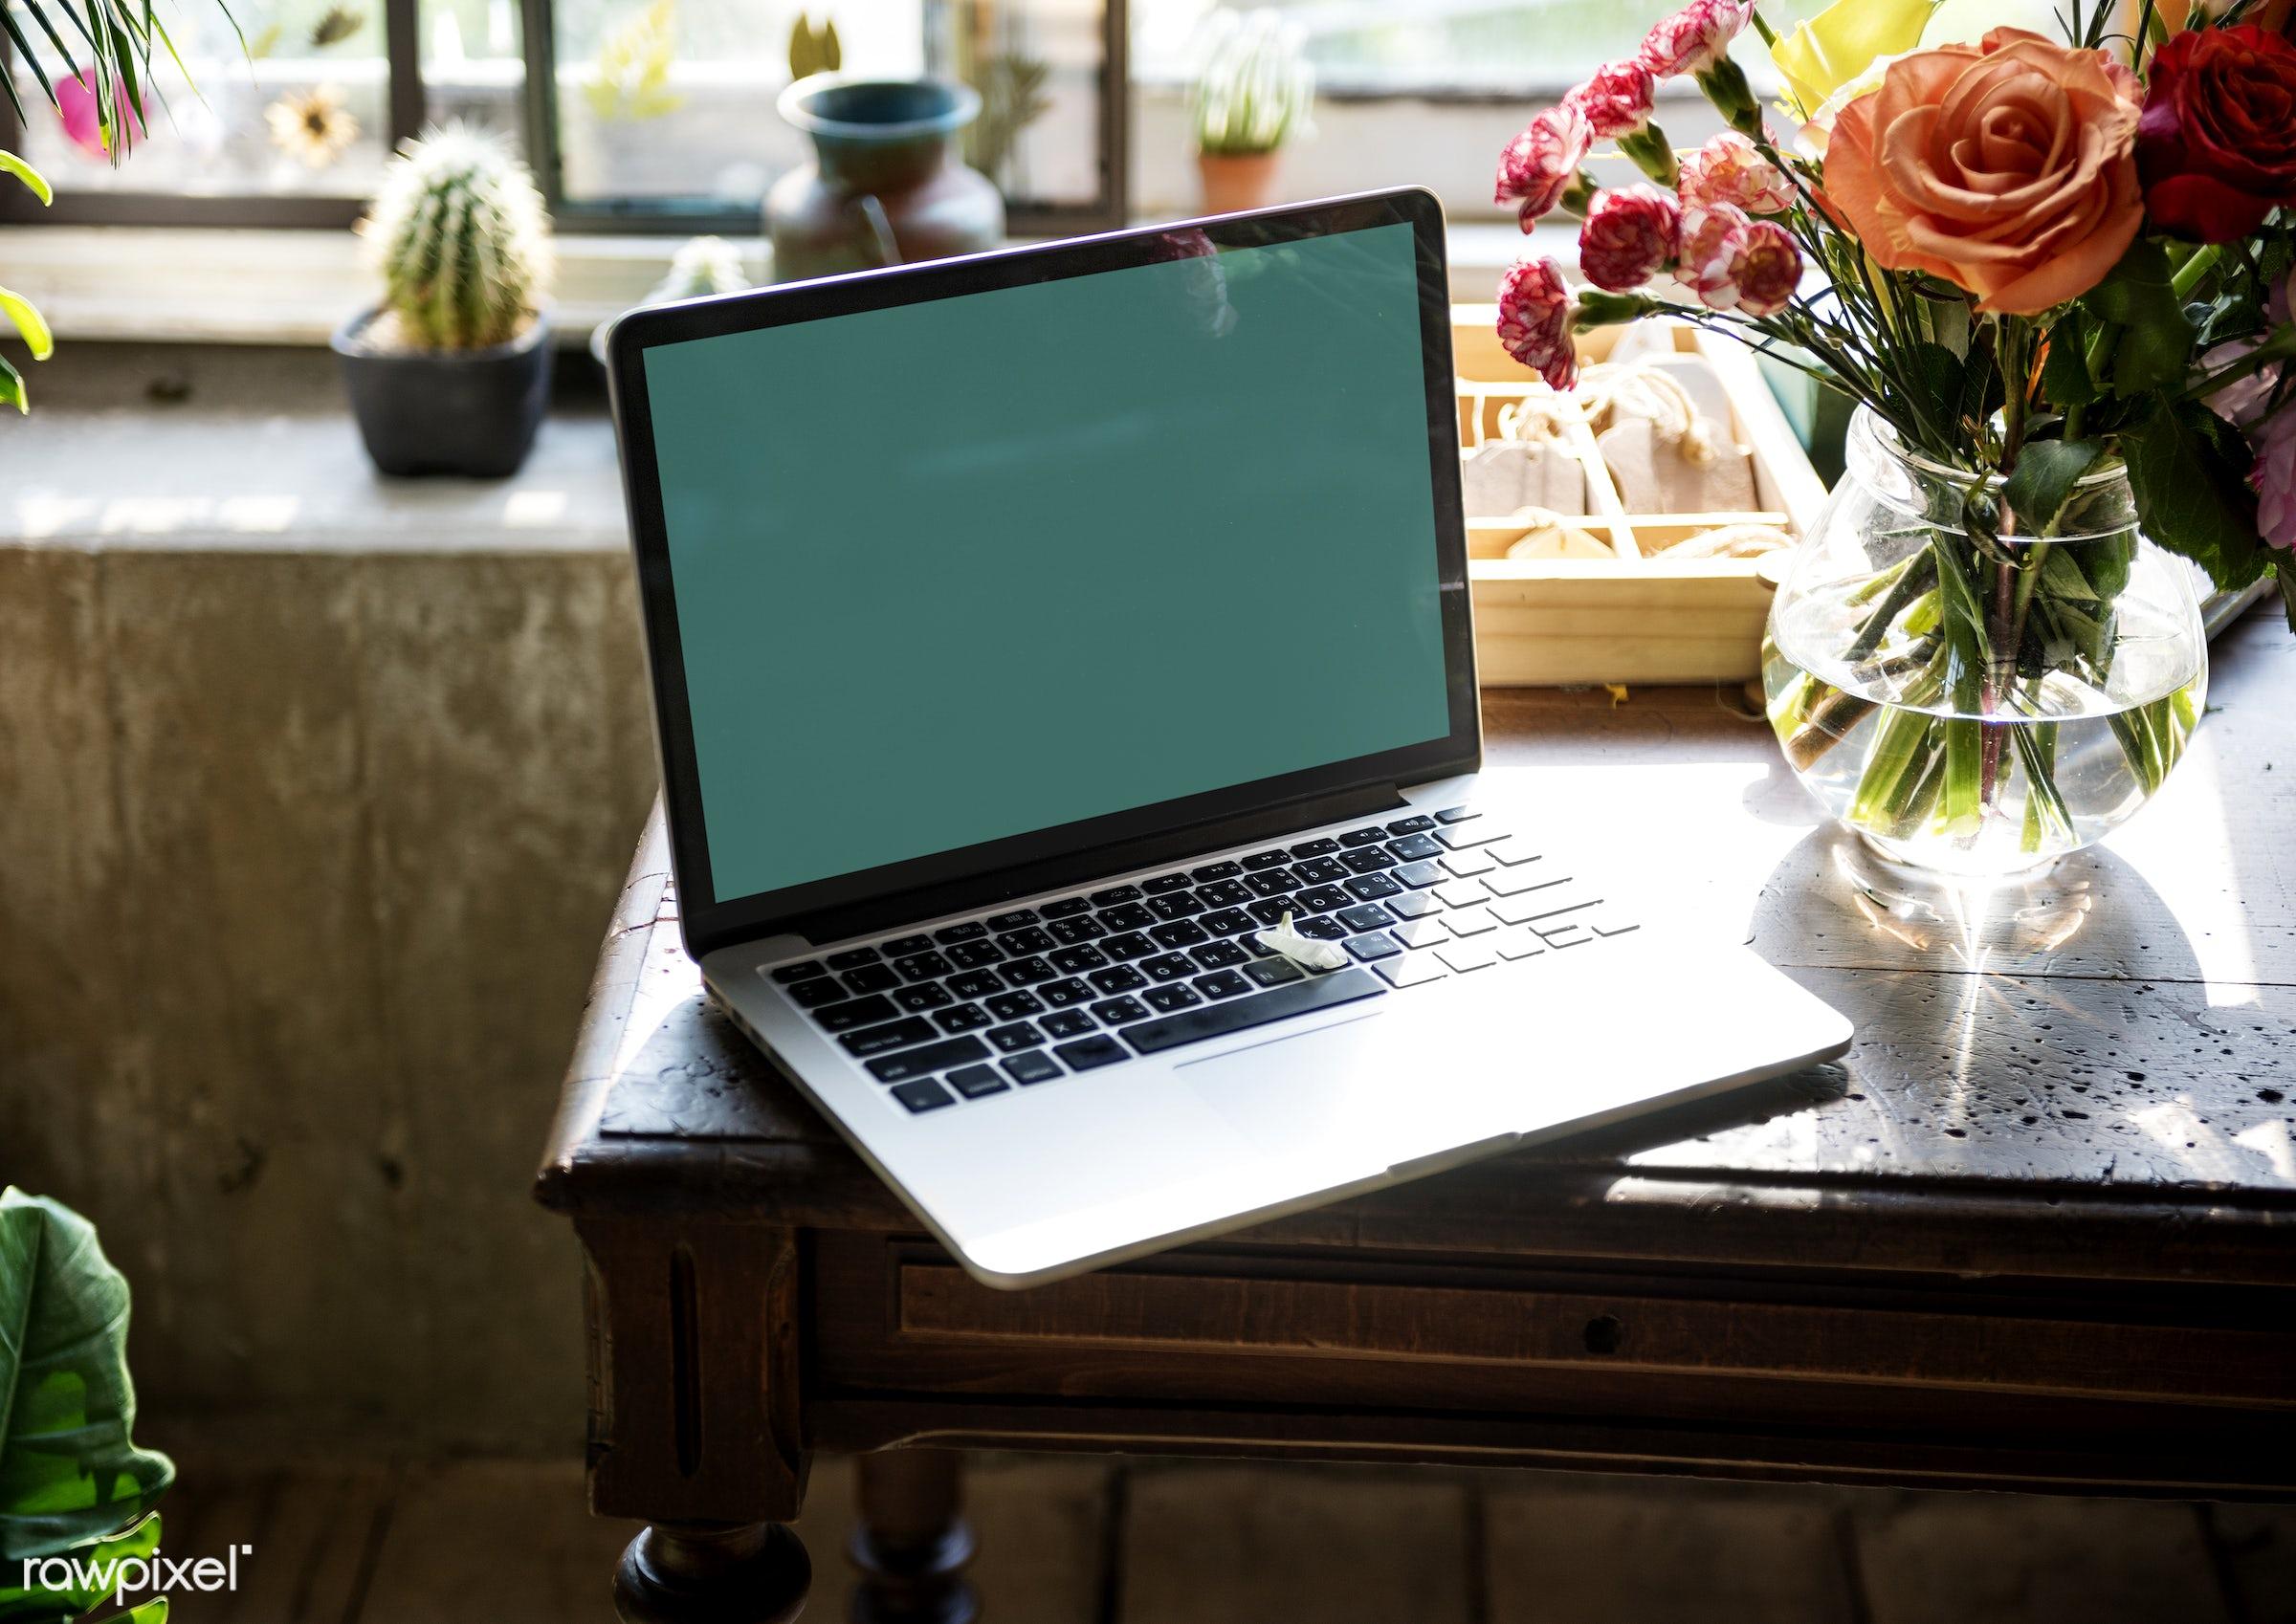 plant, copy space, technology, fresh, laptop, flower, blank, decoration, flora, refreshment, leisure, table, florist, rose,...